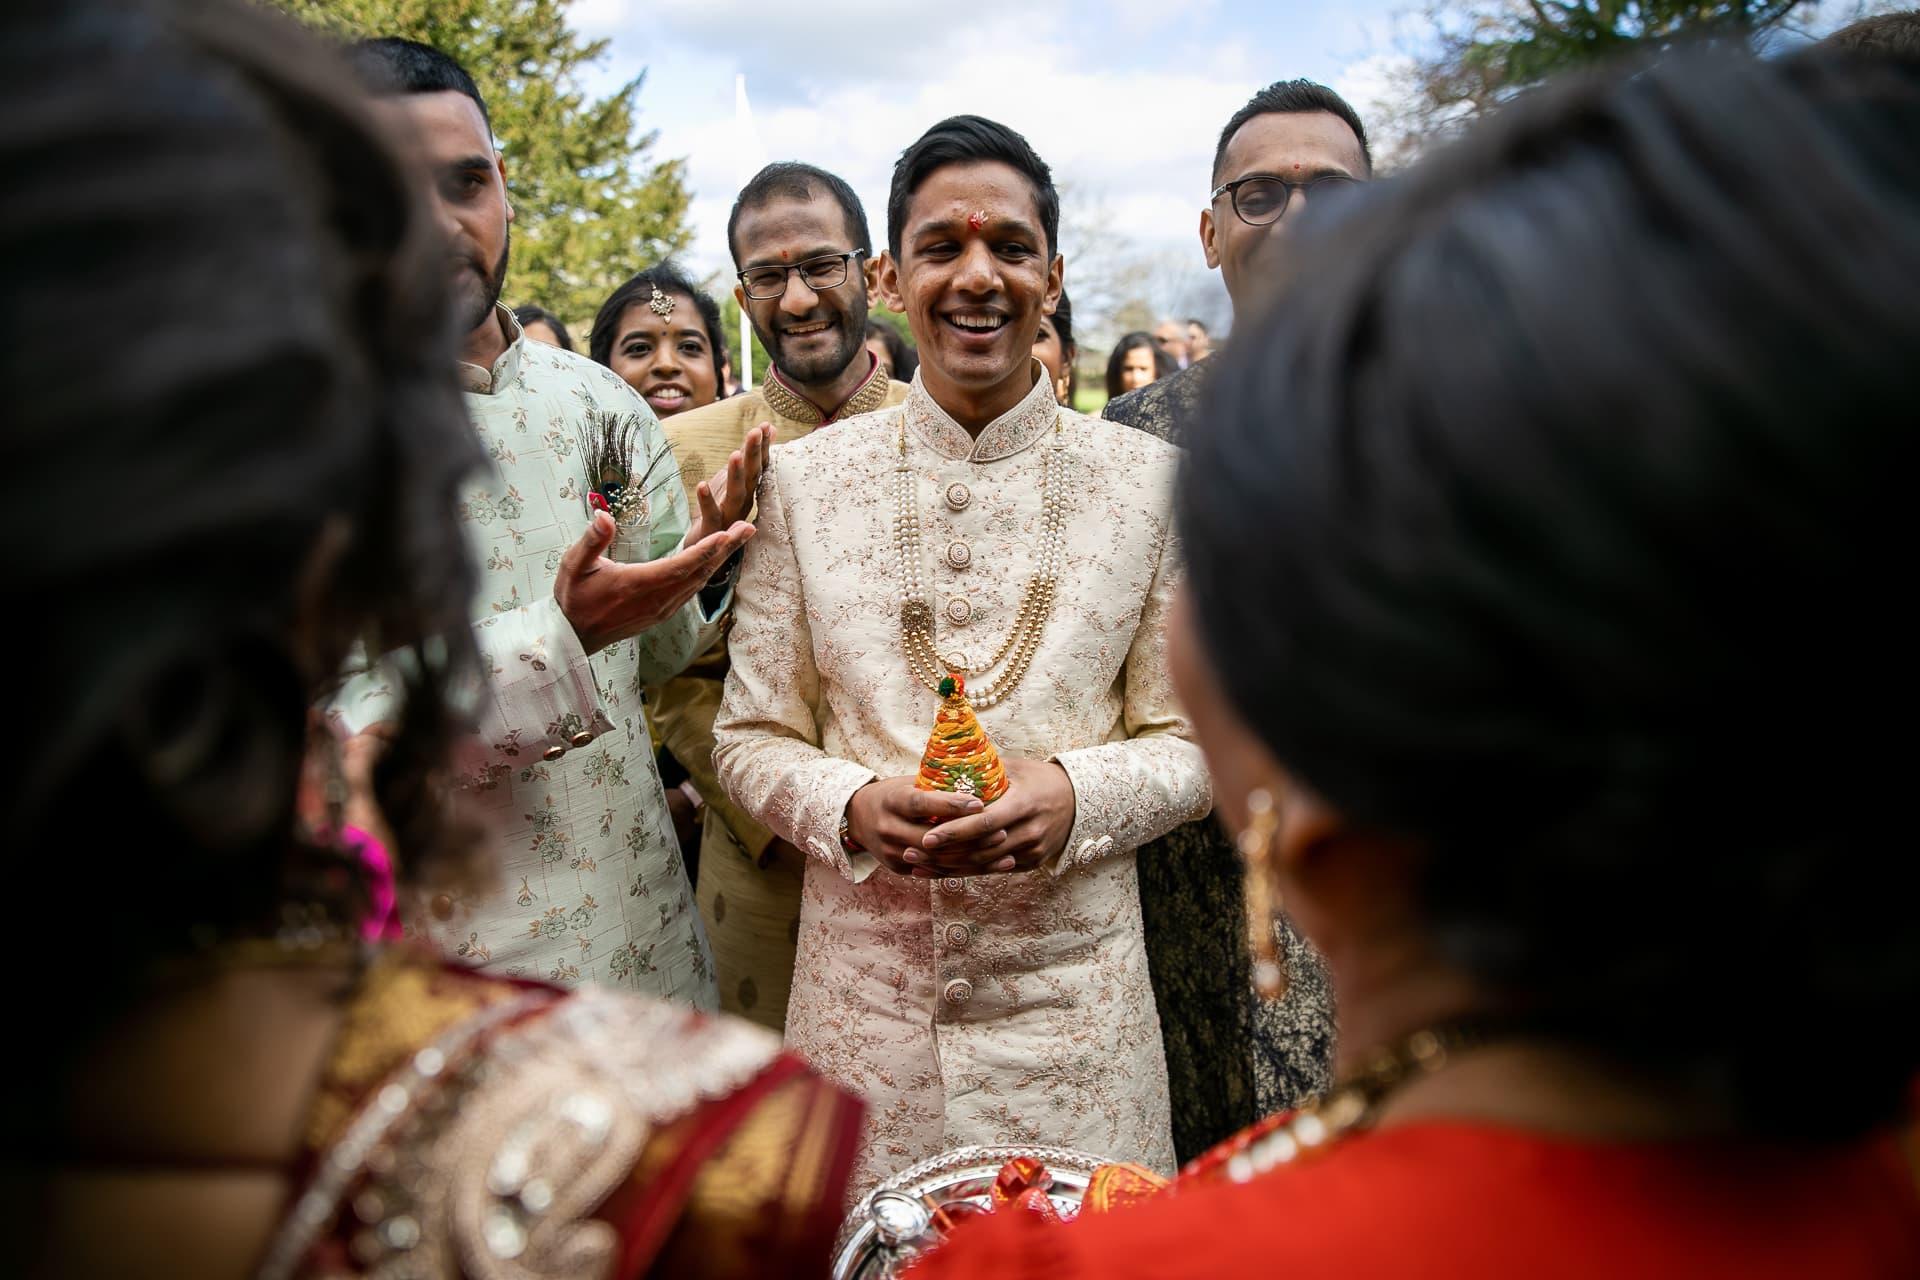 Groom welcoming ceremony